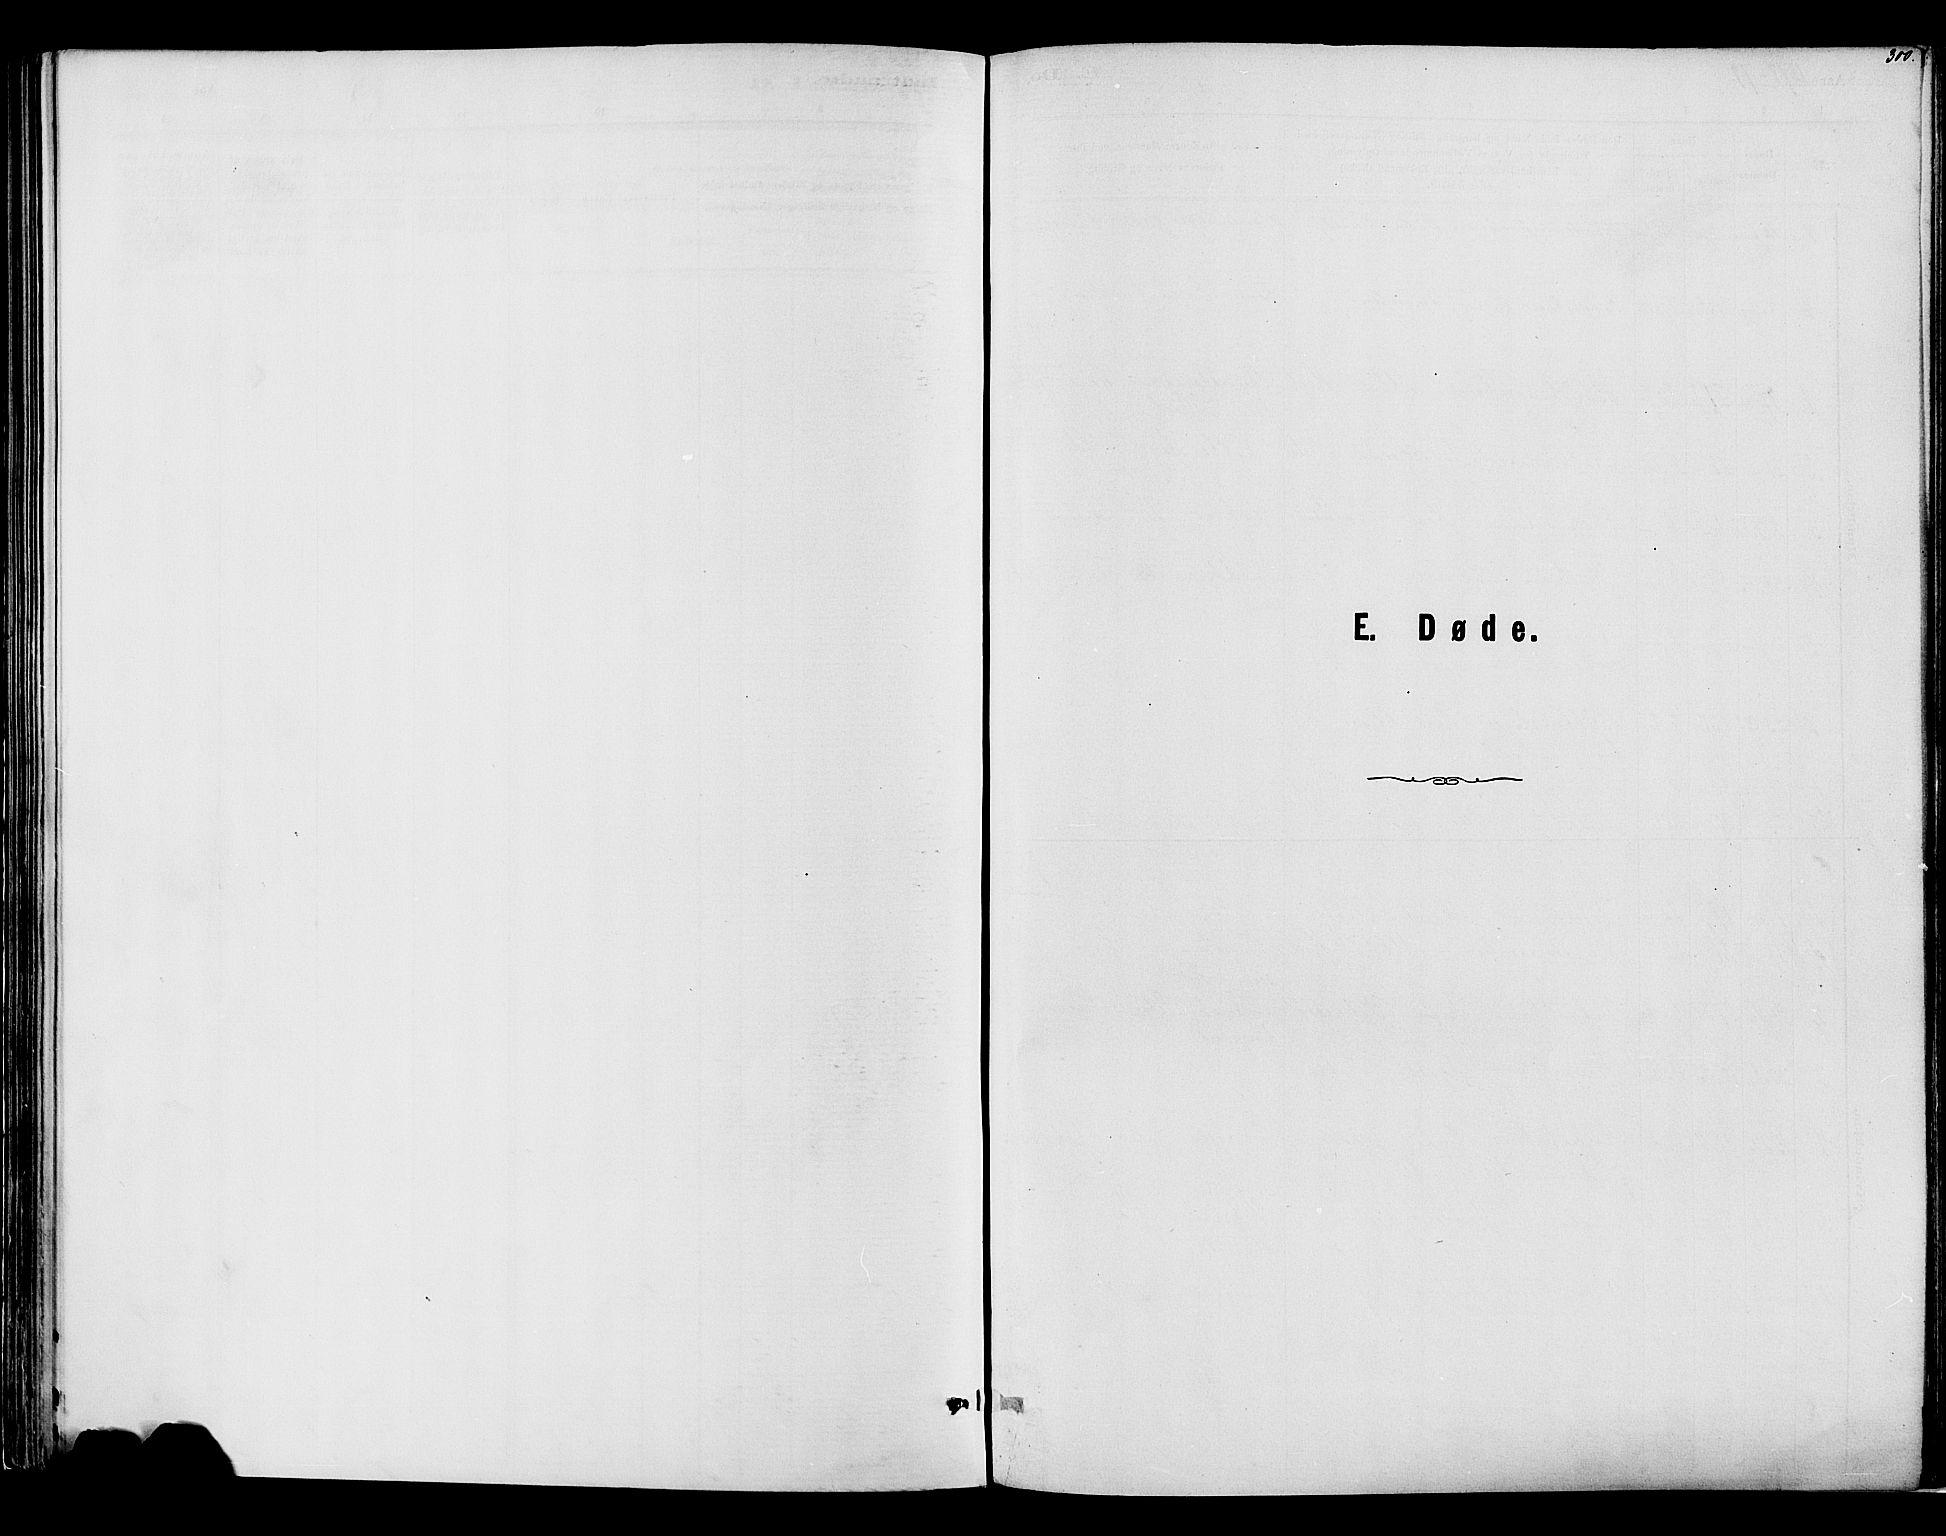 SAH, Vardal prestekontor, H/Ha/Haa/L0008: Ministerialbok nr. 8, 1878-1890, s. 300